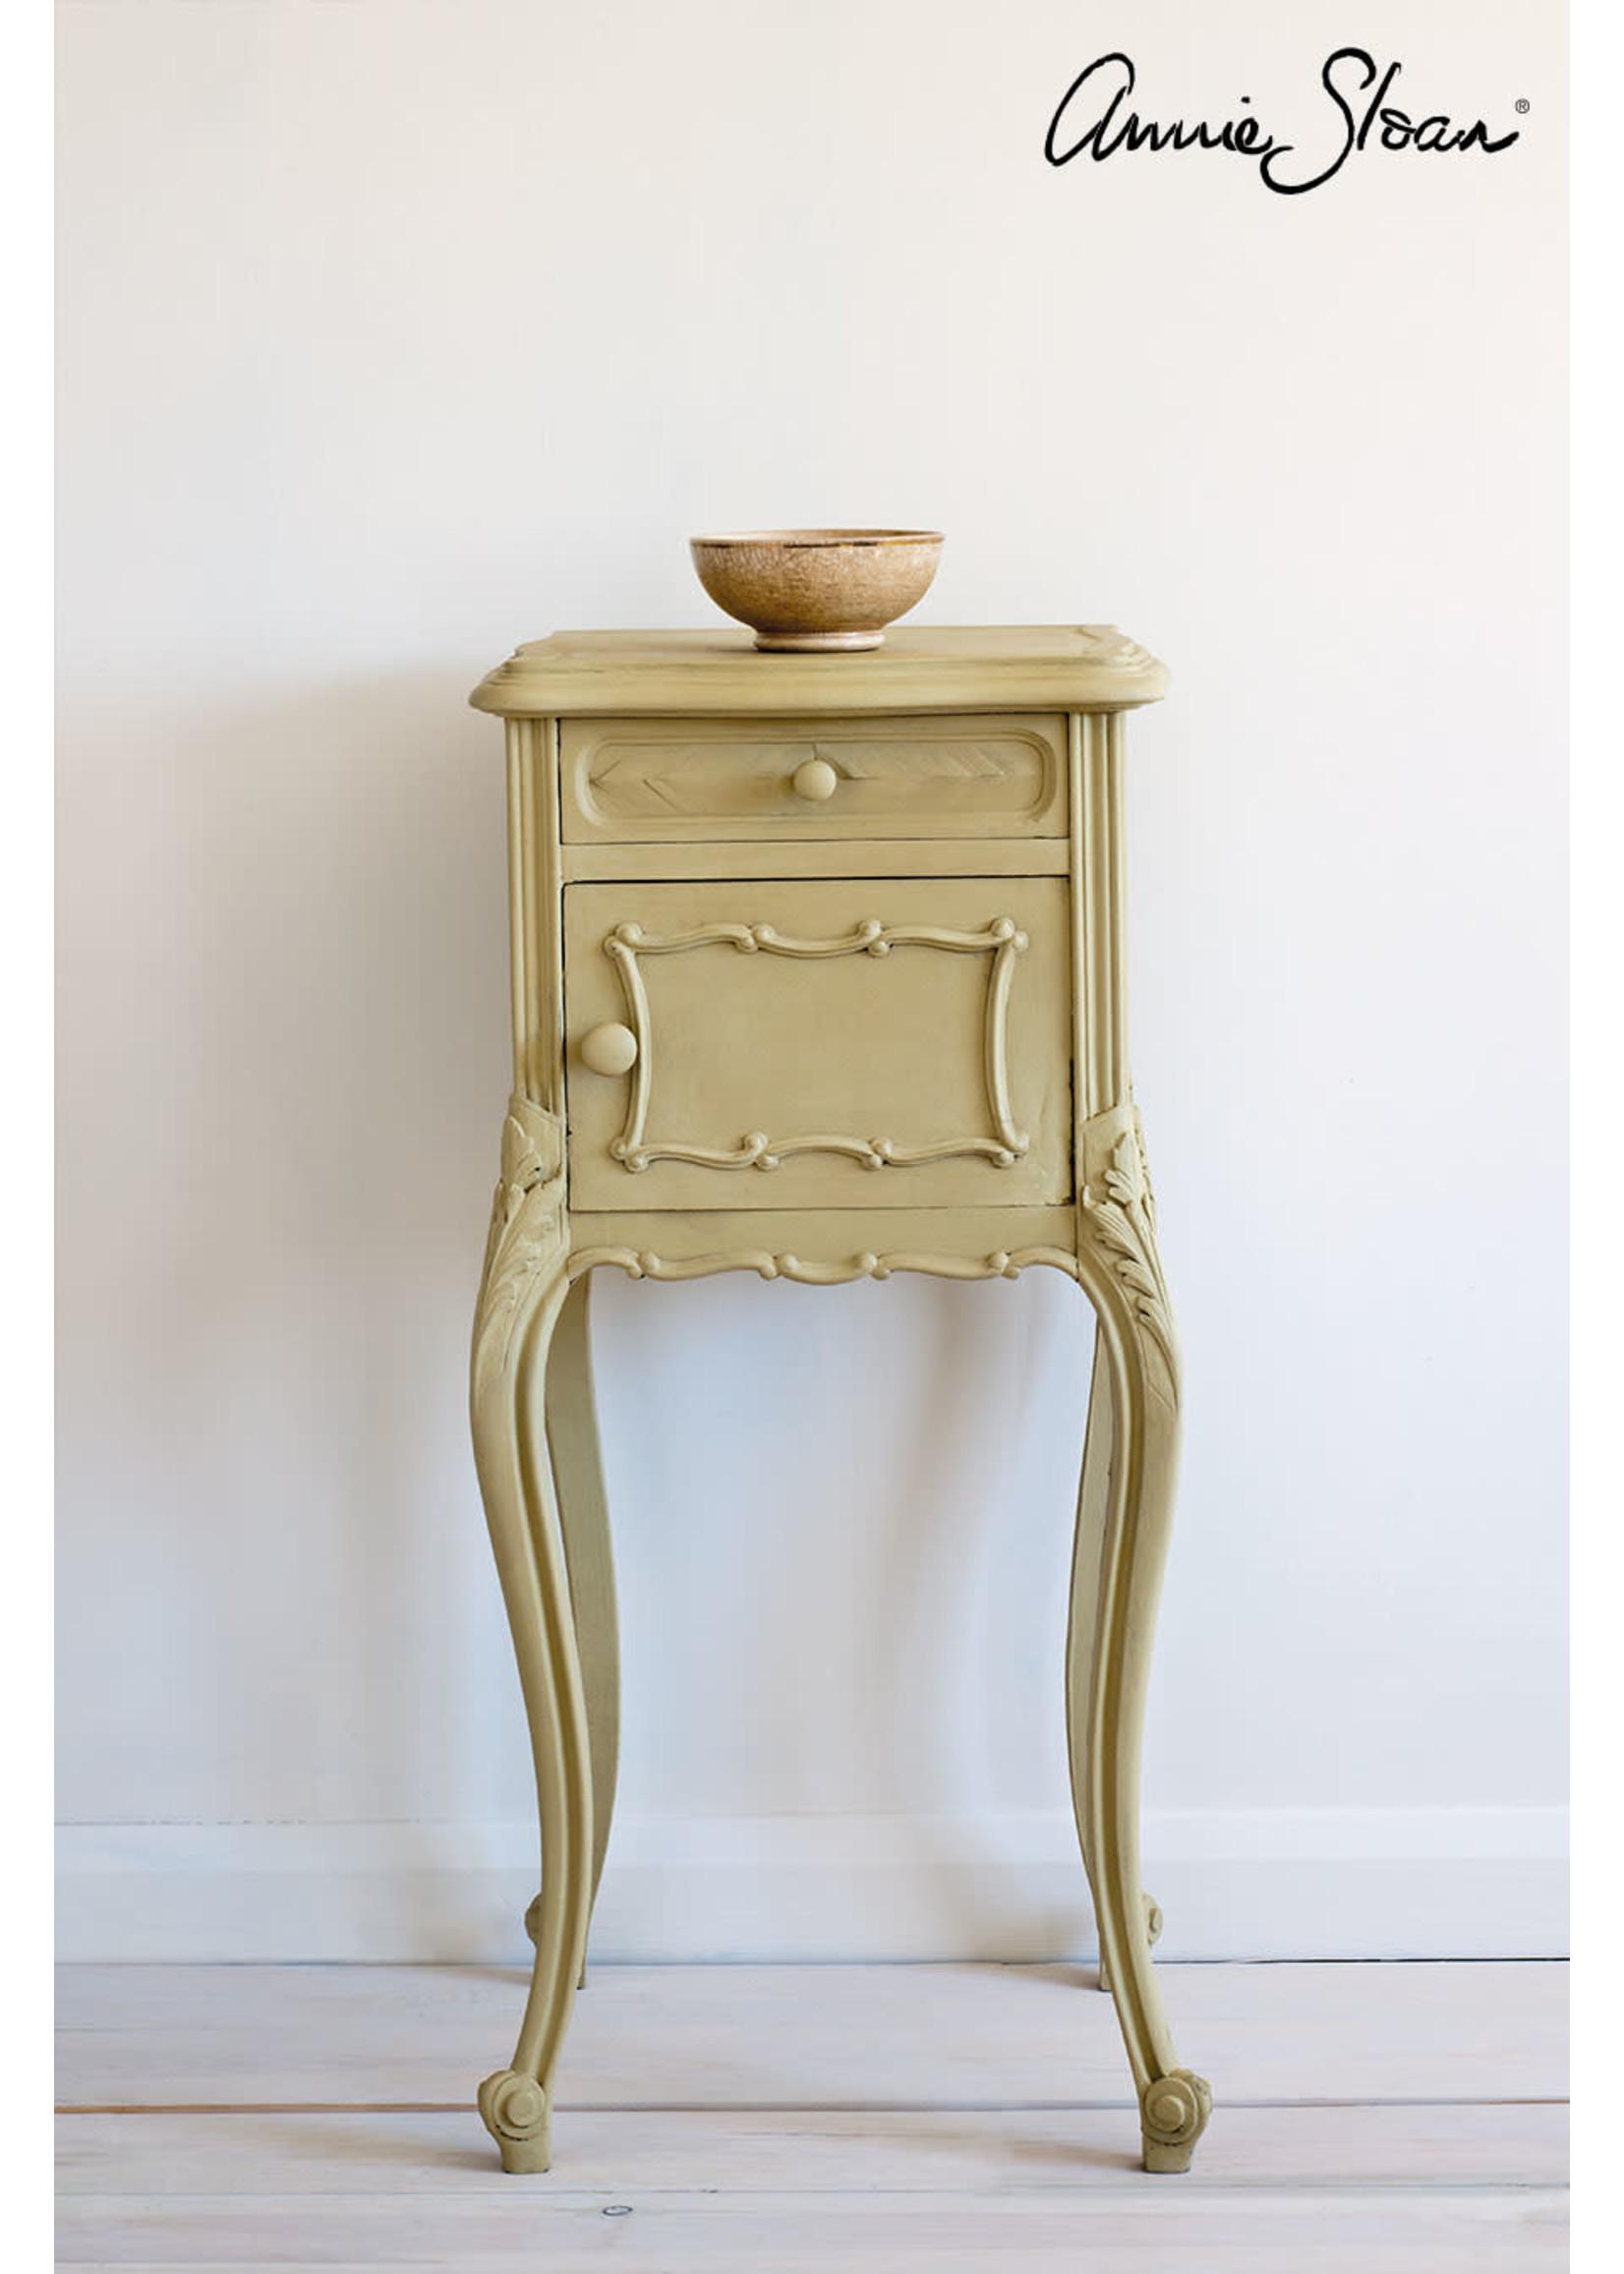 Annie Sloan Chalk Paint® Versailles Annie Sloan Chalk Paint ®